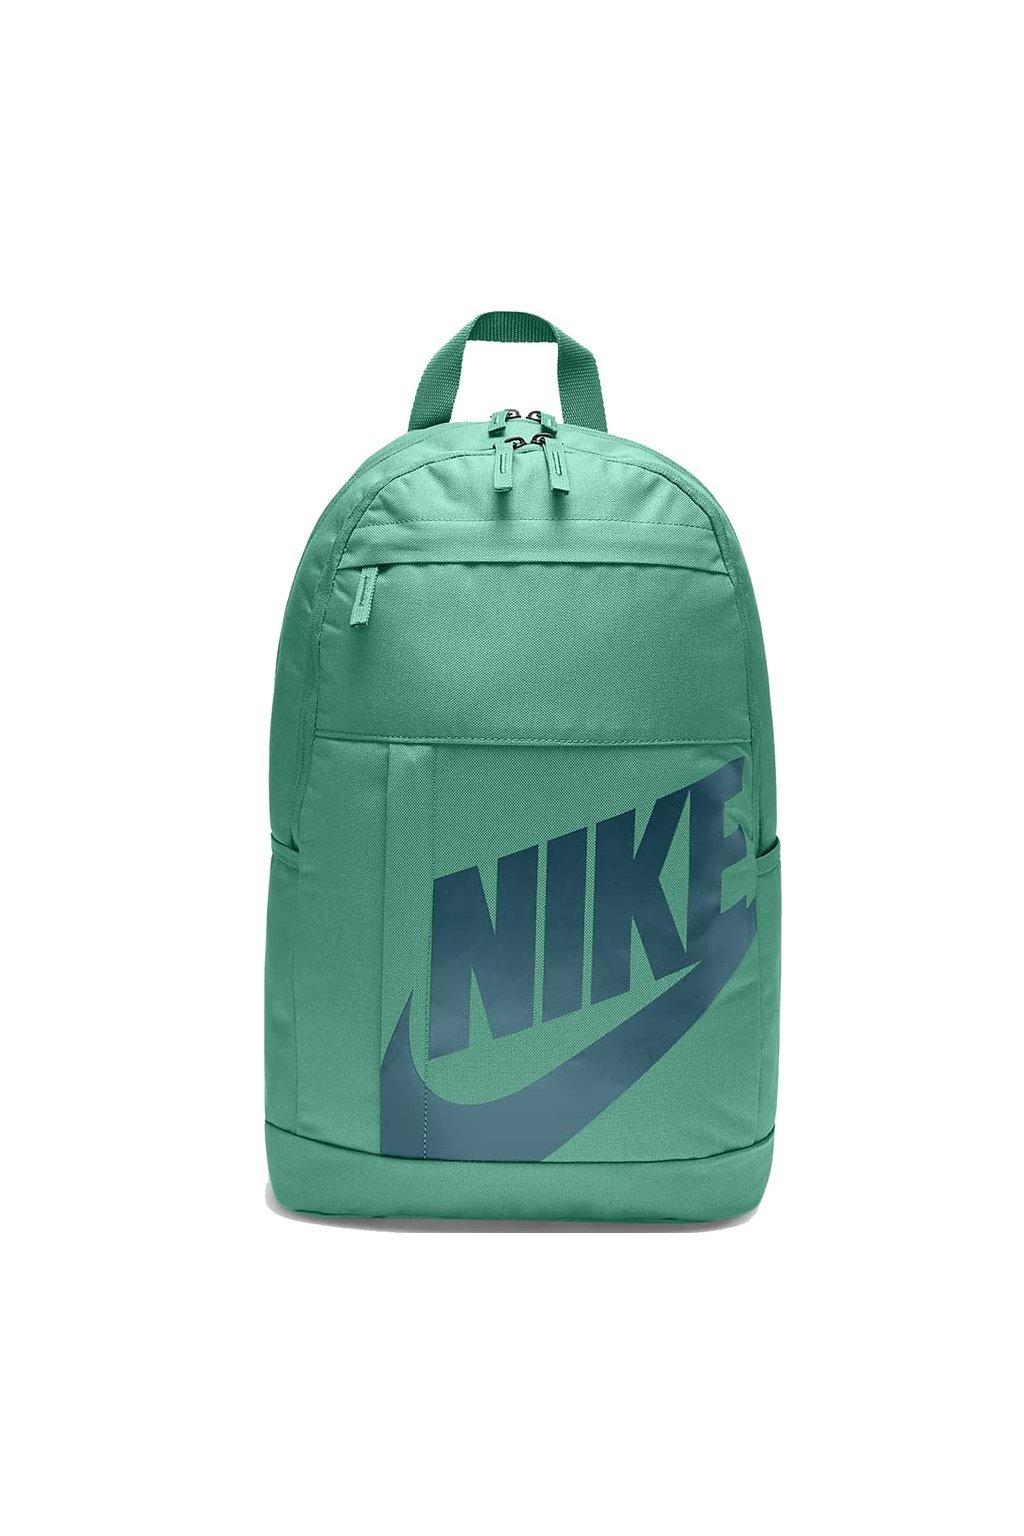 Batoh Nike Elemental 2.0 zelený BA5876 320